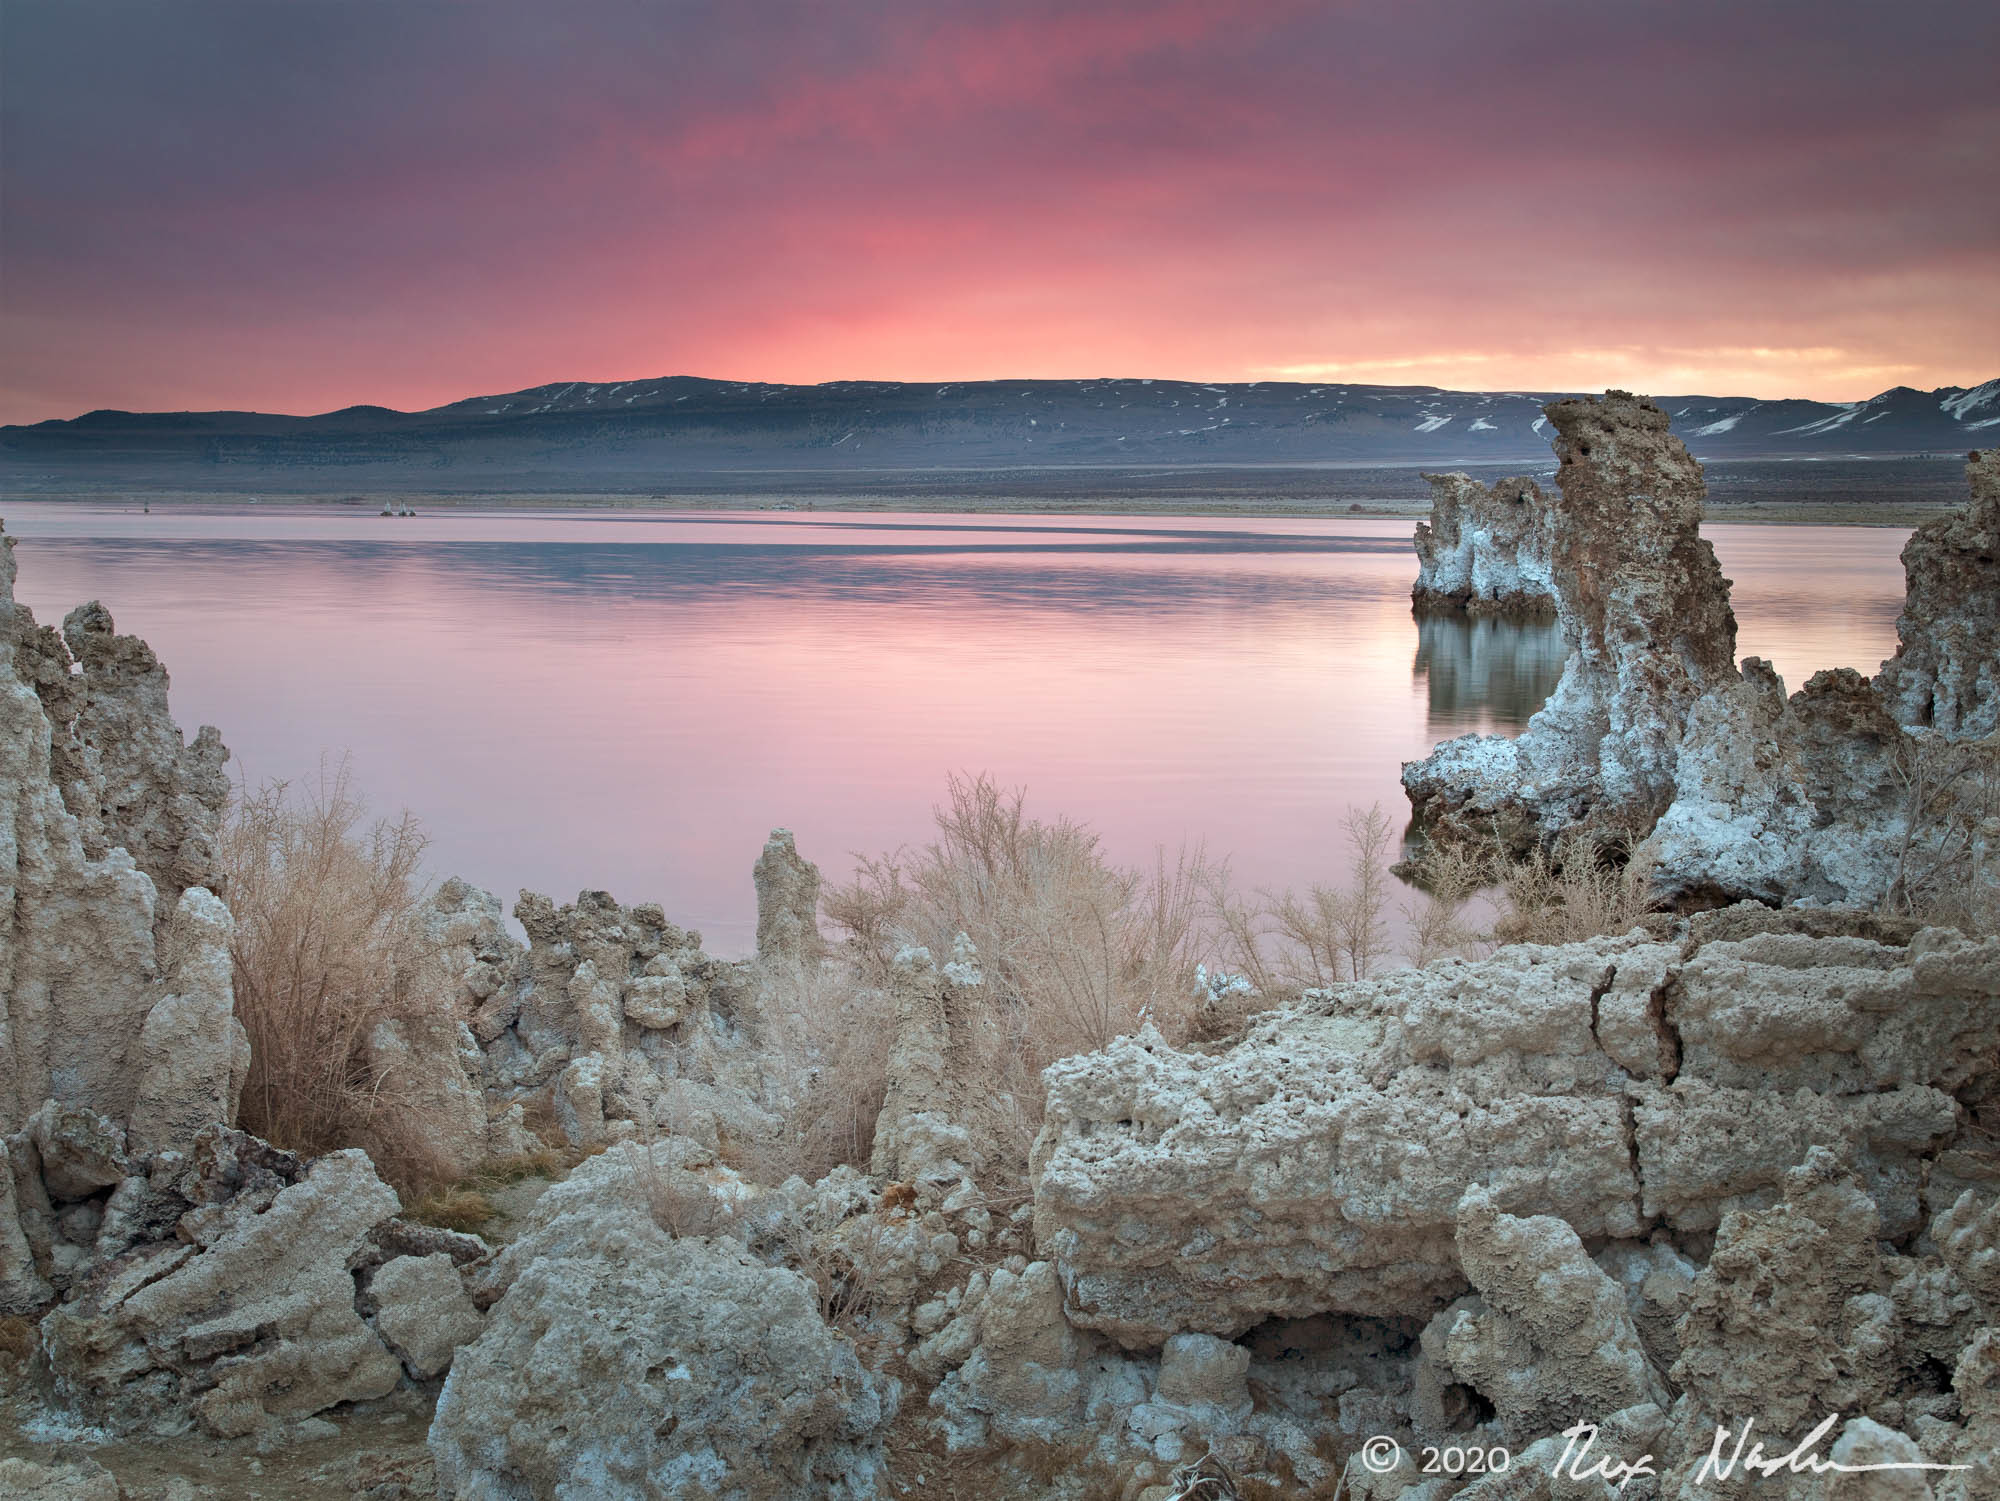 Shades of White - Mono Lake, CA